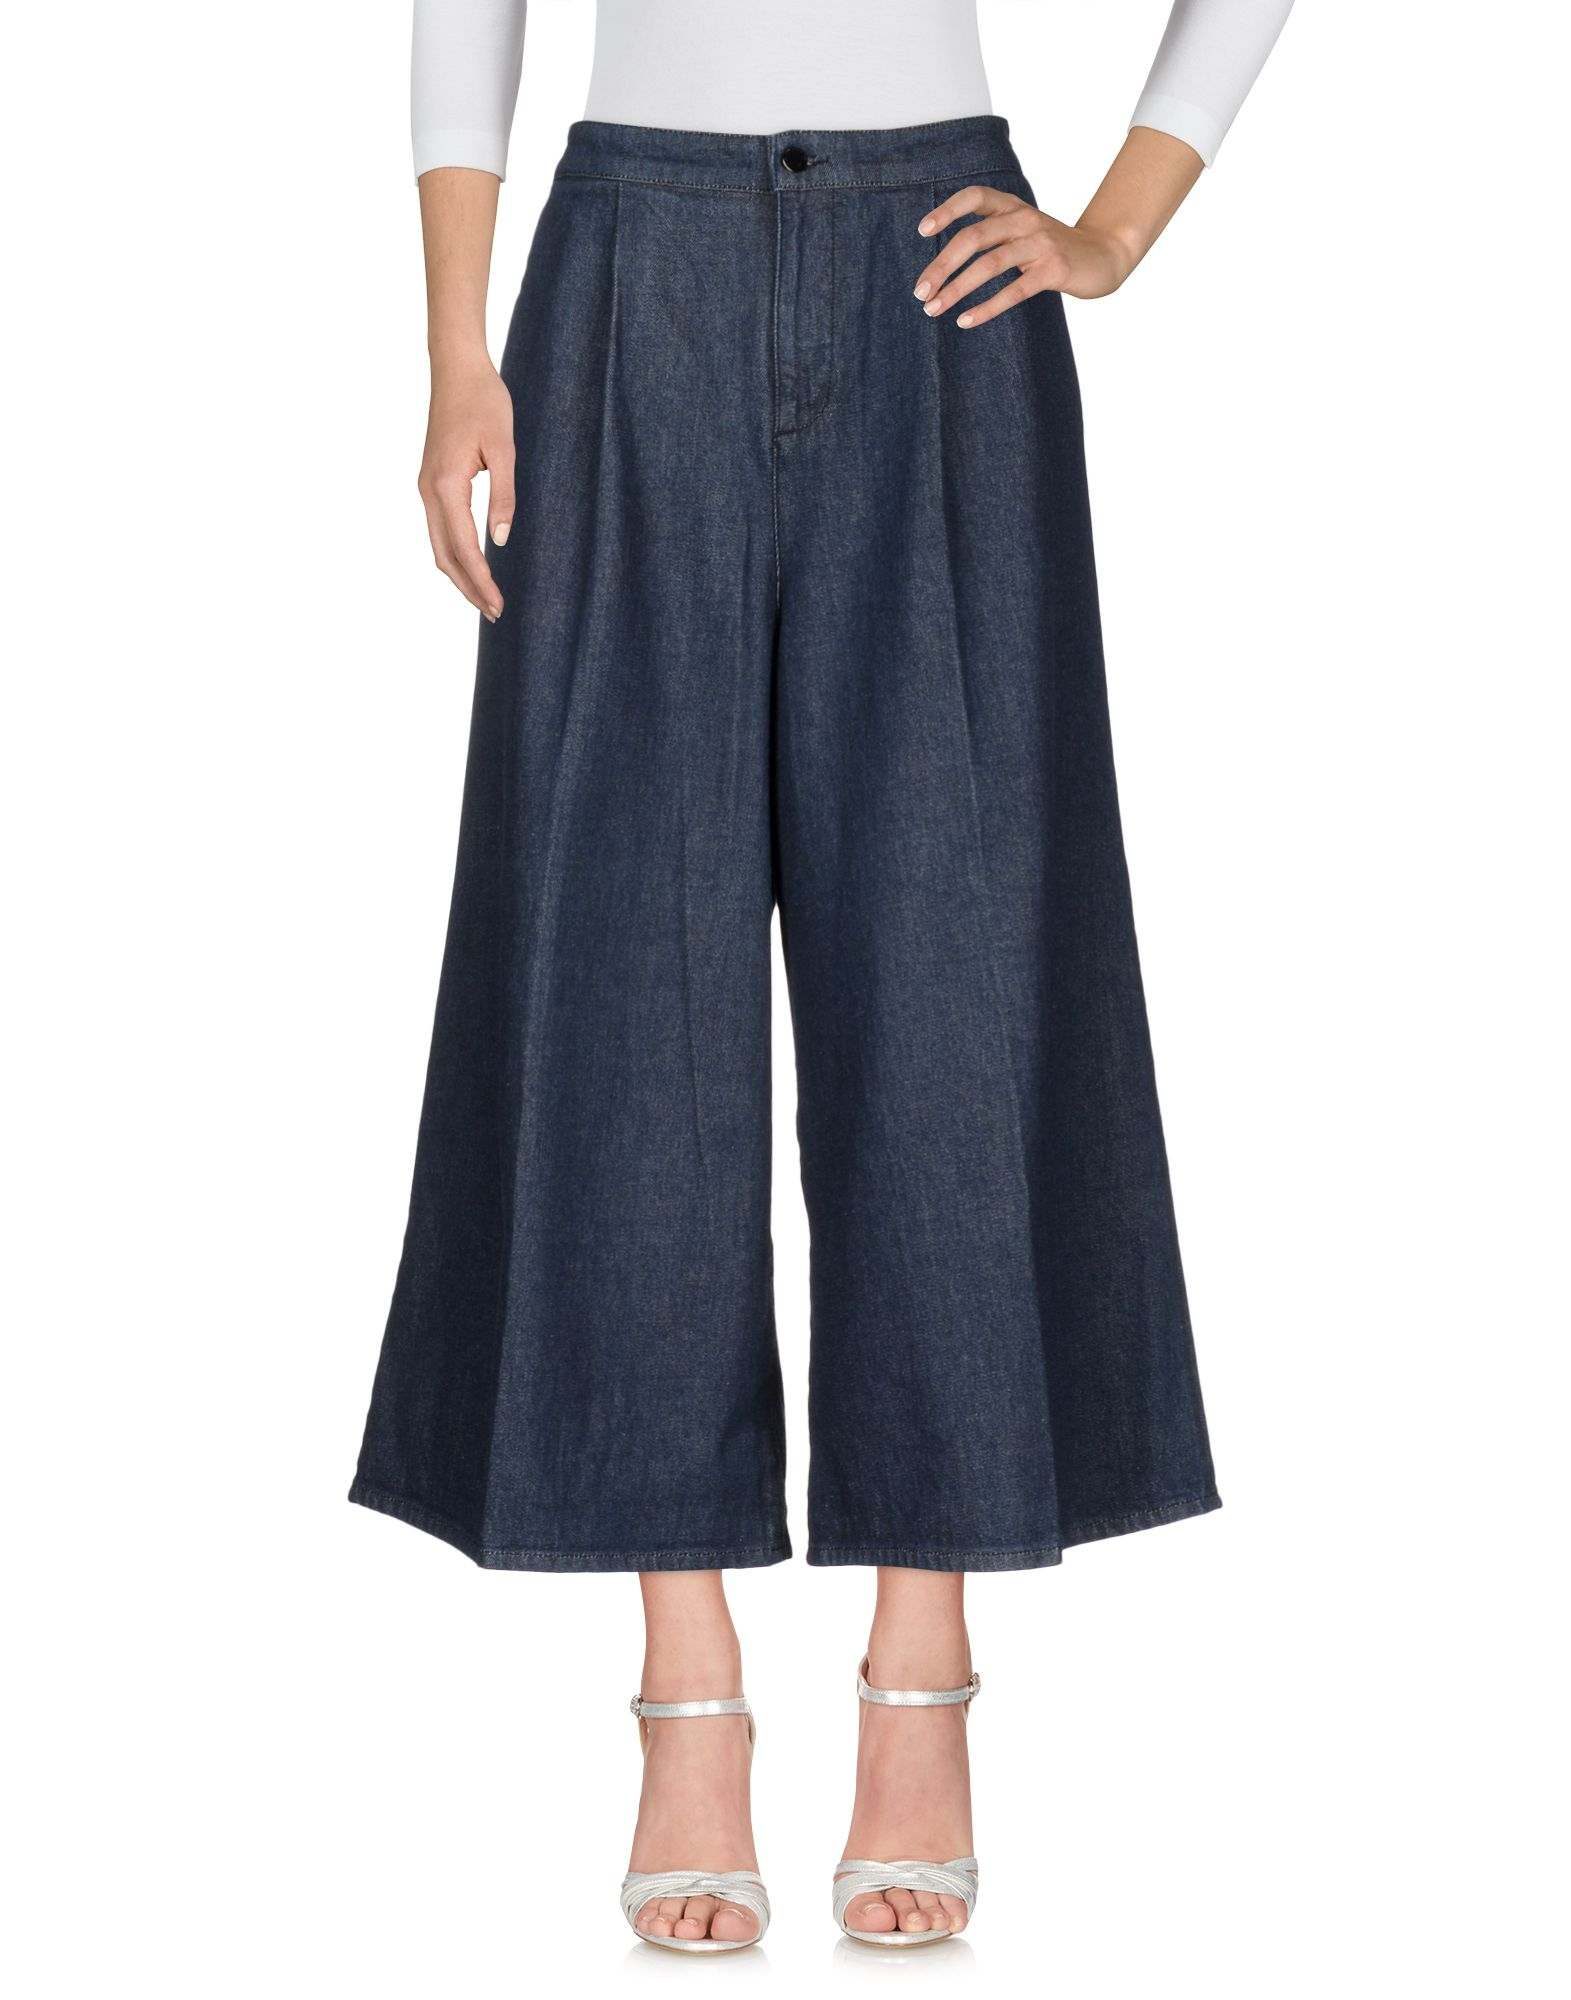 Pantaloni Jeans Victoria, Victoria Beckham Donna - Acquista online su